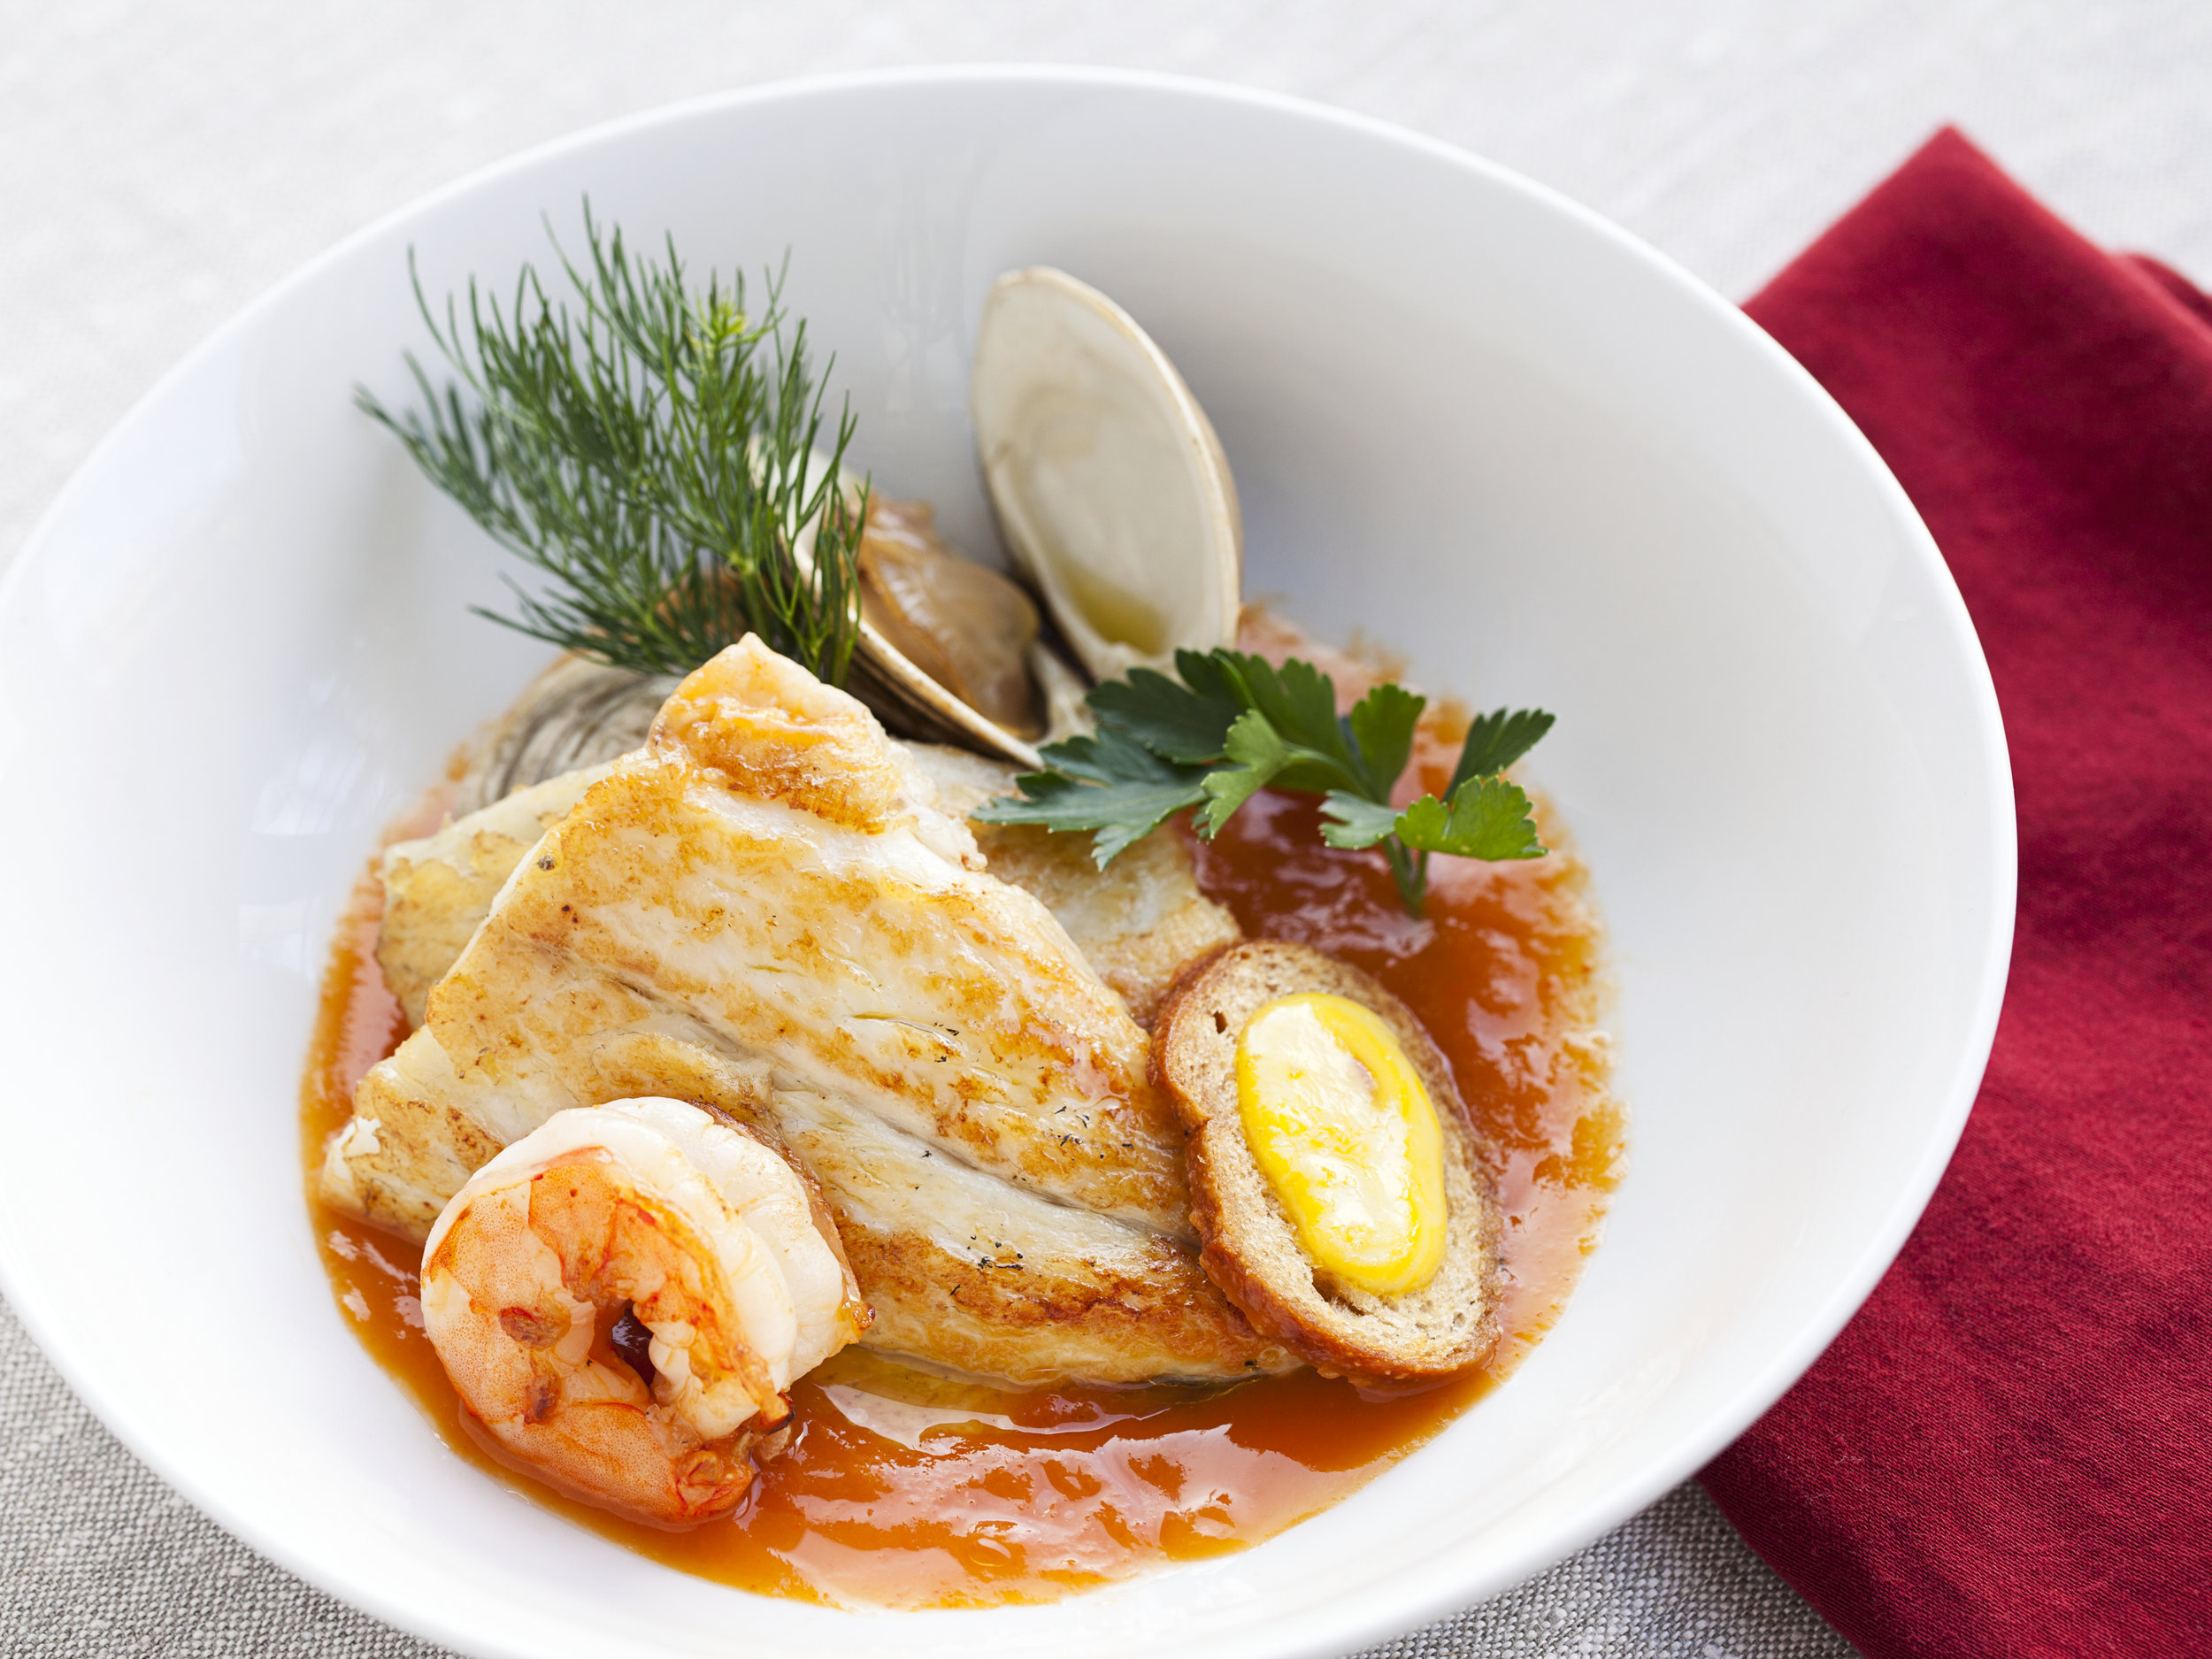 Branzino with bouillabaisse sauce, t clams, seared shrimp, and saffron crouton.jpg